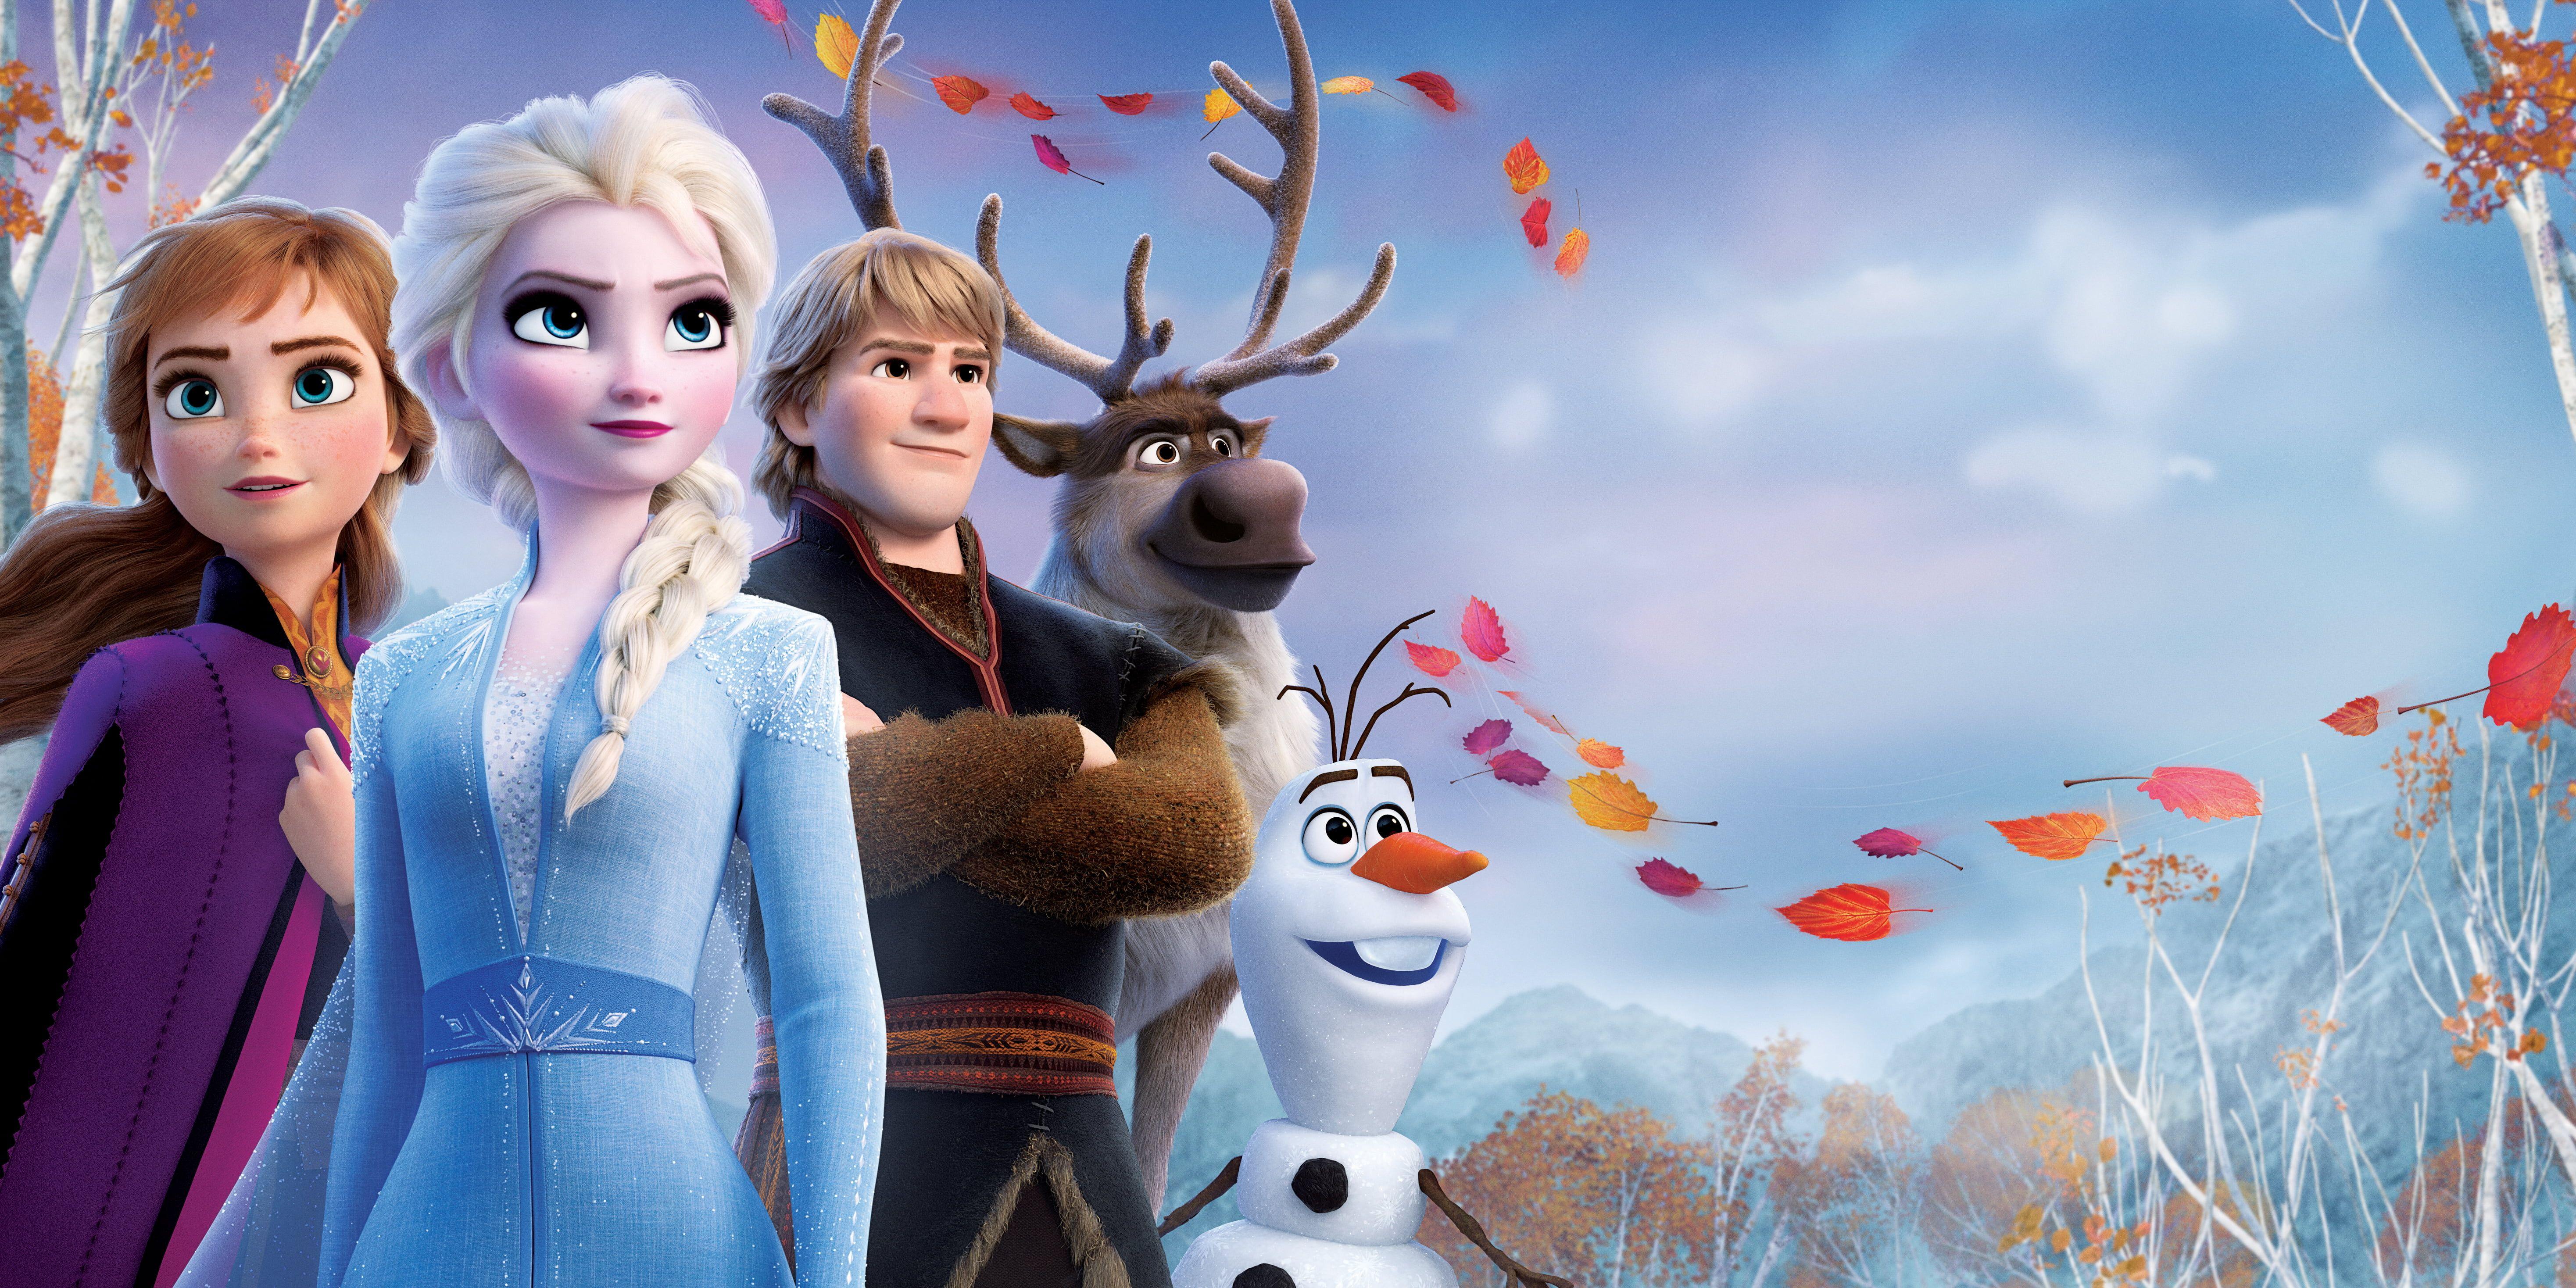 Movie Frozen 2 Anna Frozen Elsa Frozen Kristoff Frozen Olaf Frozen Sven Frozen 5k Wallpaper Hdwallpaper Frozen Wallpaper Pet Logo Design Frozen